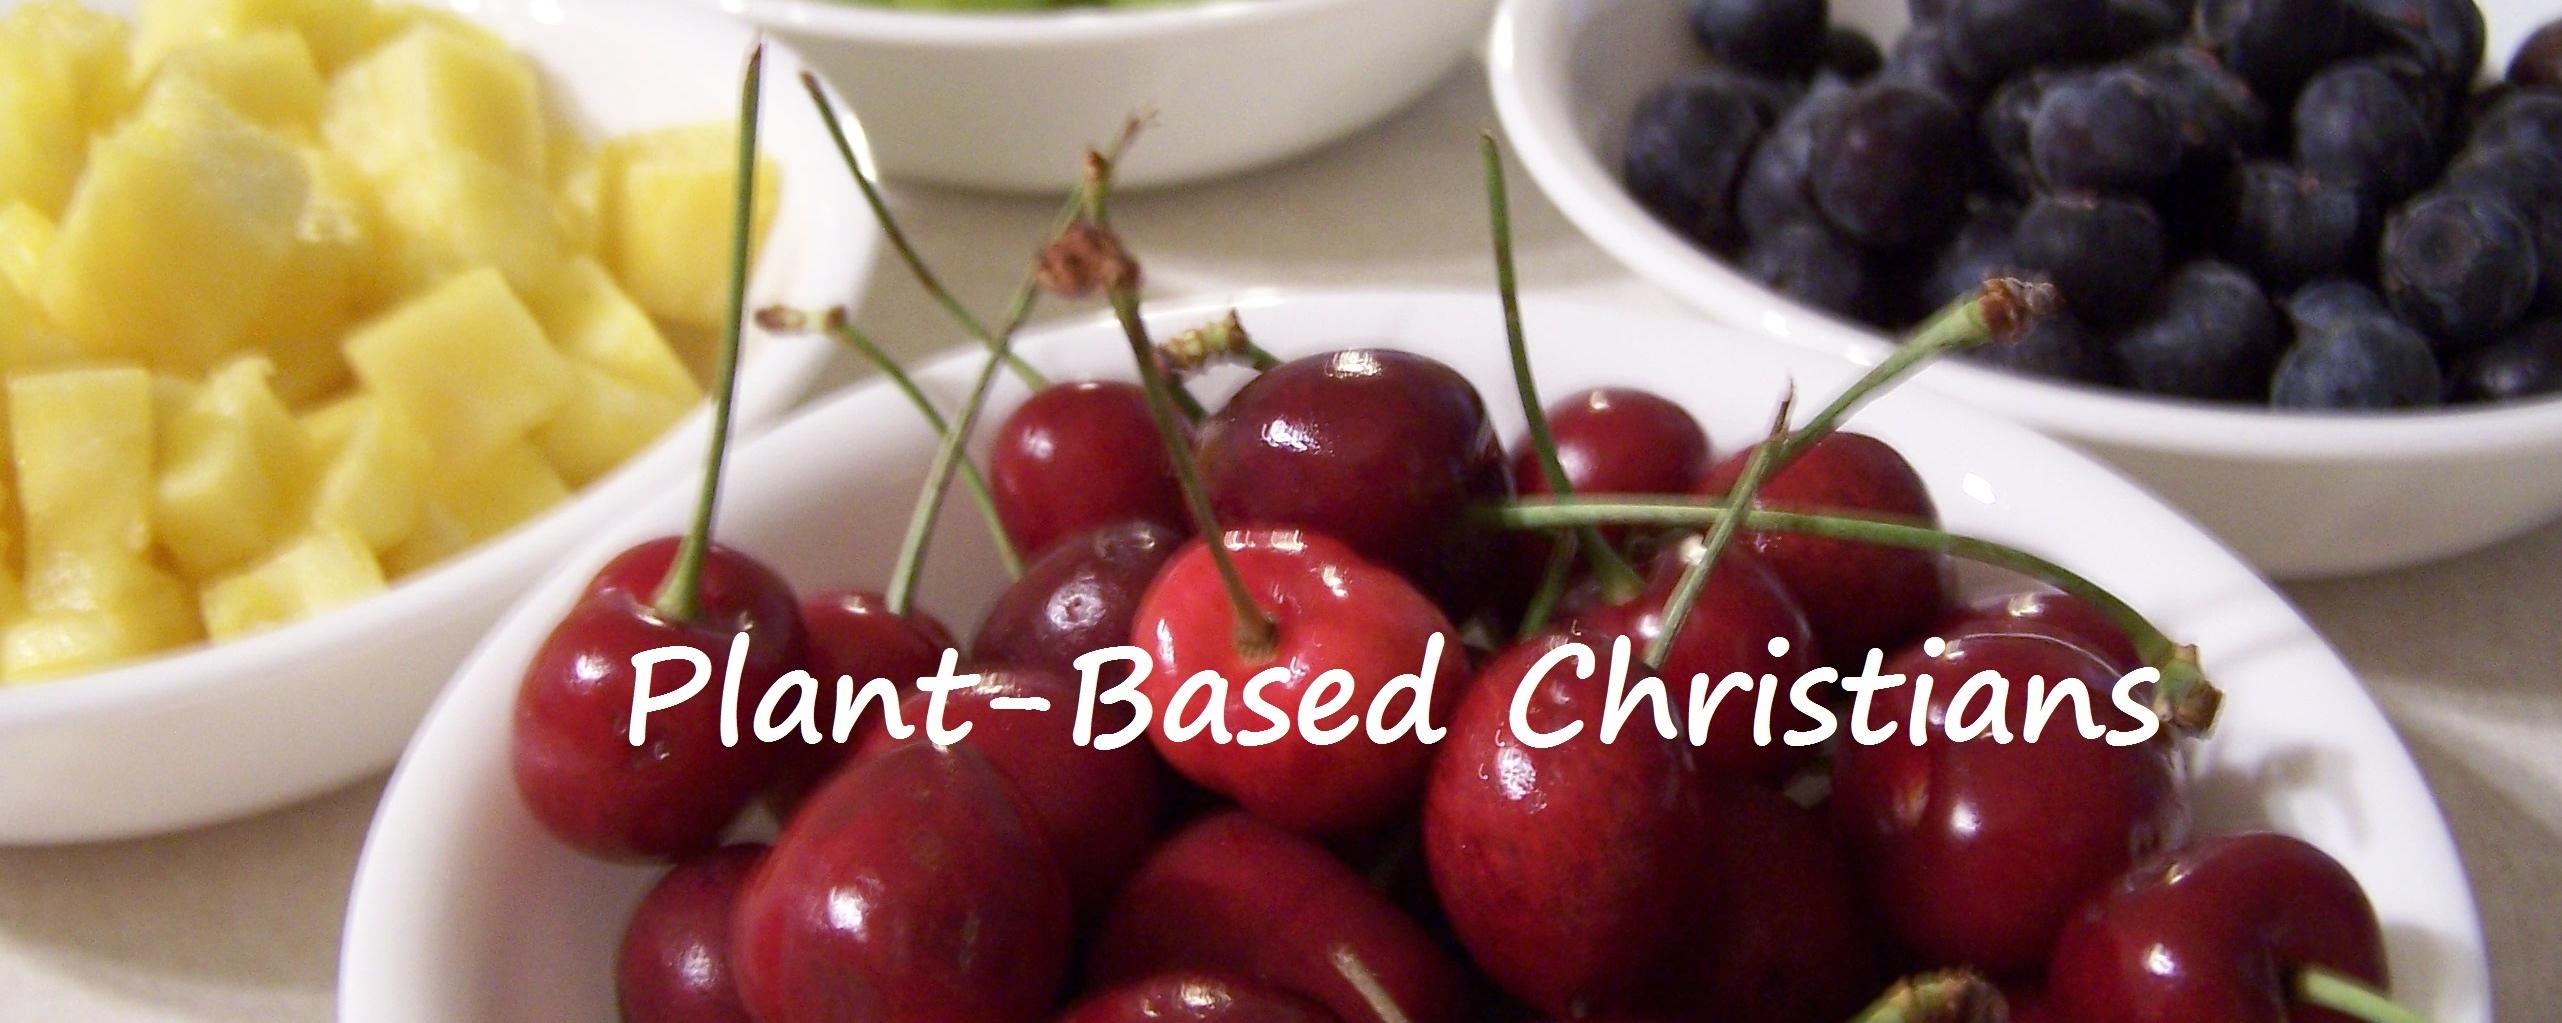 Plant Based Christians